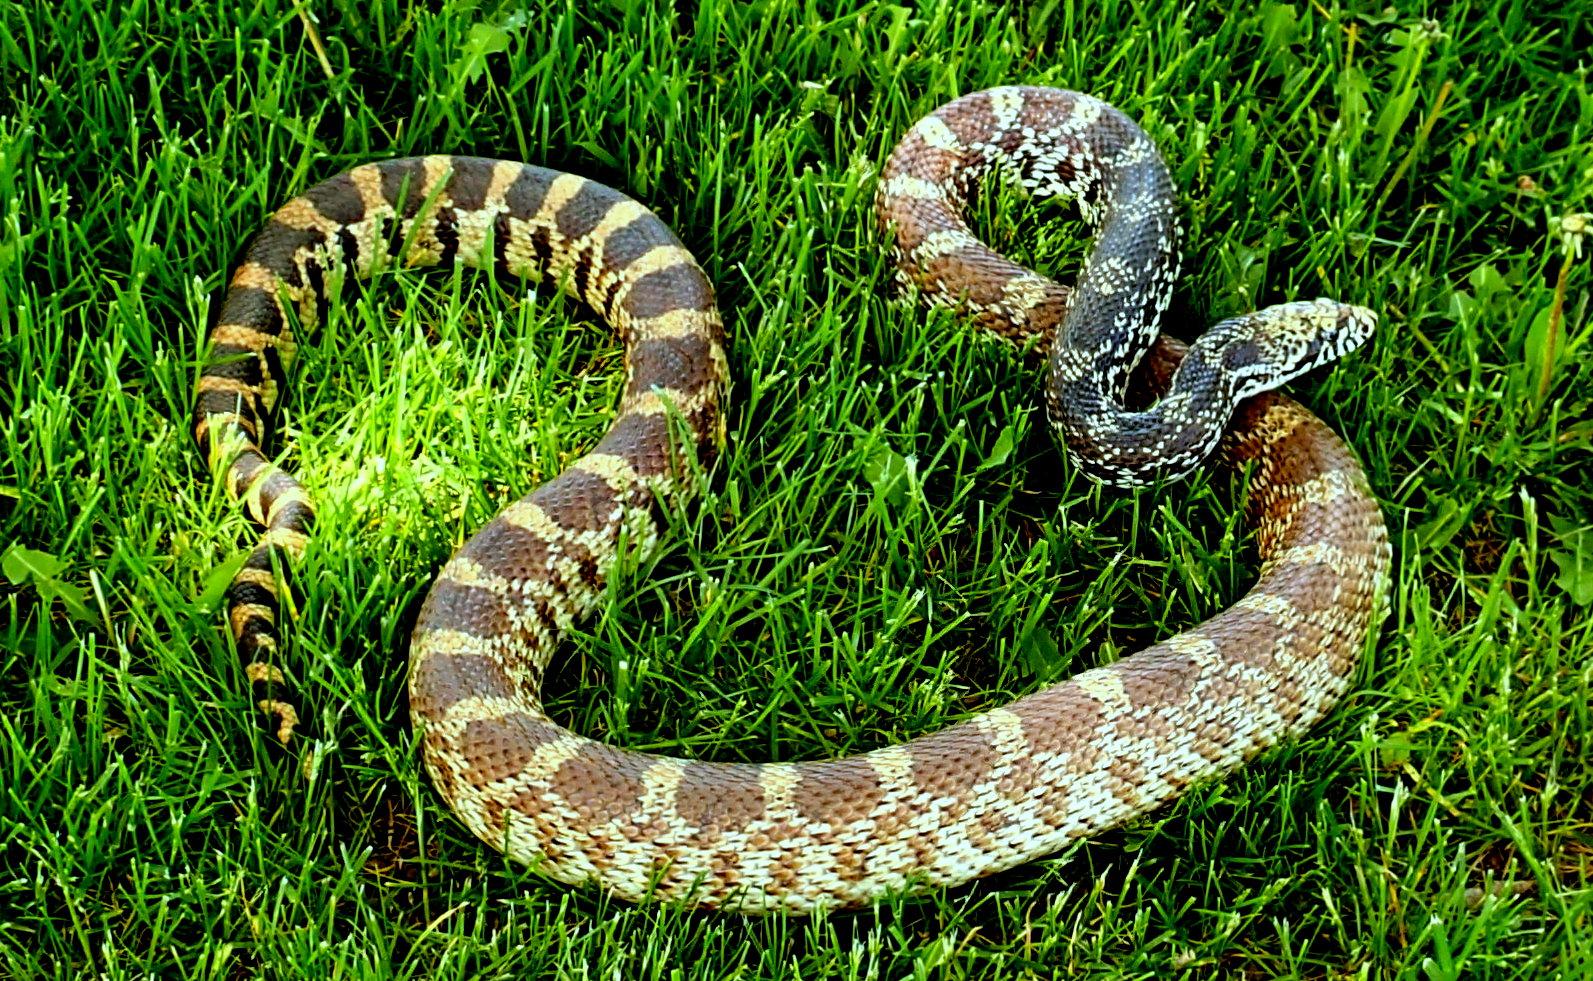 snake - photo #25